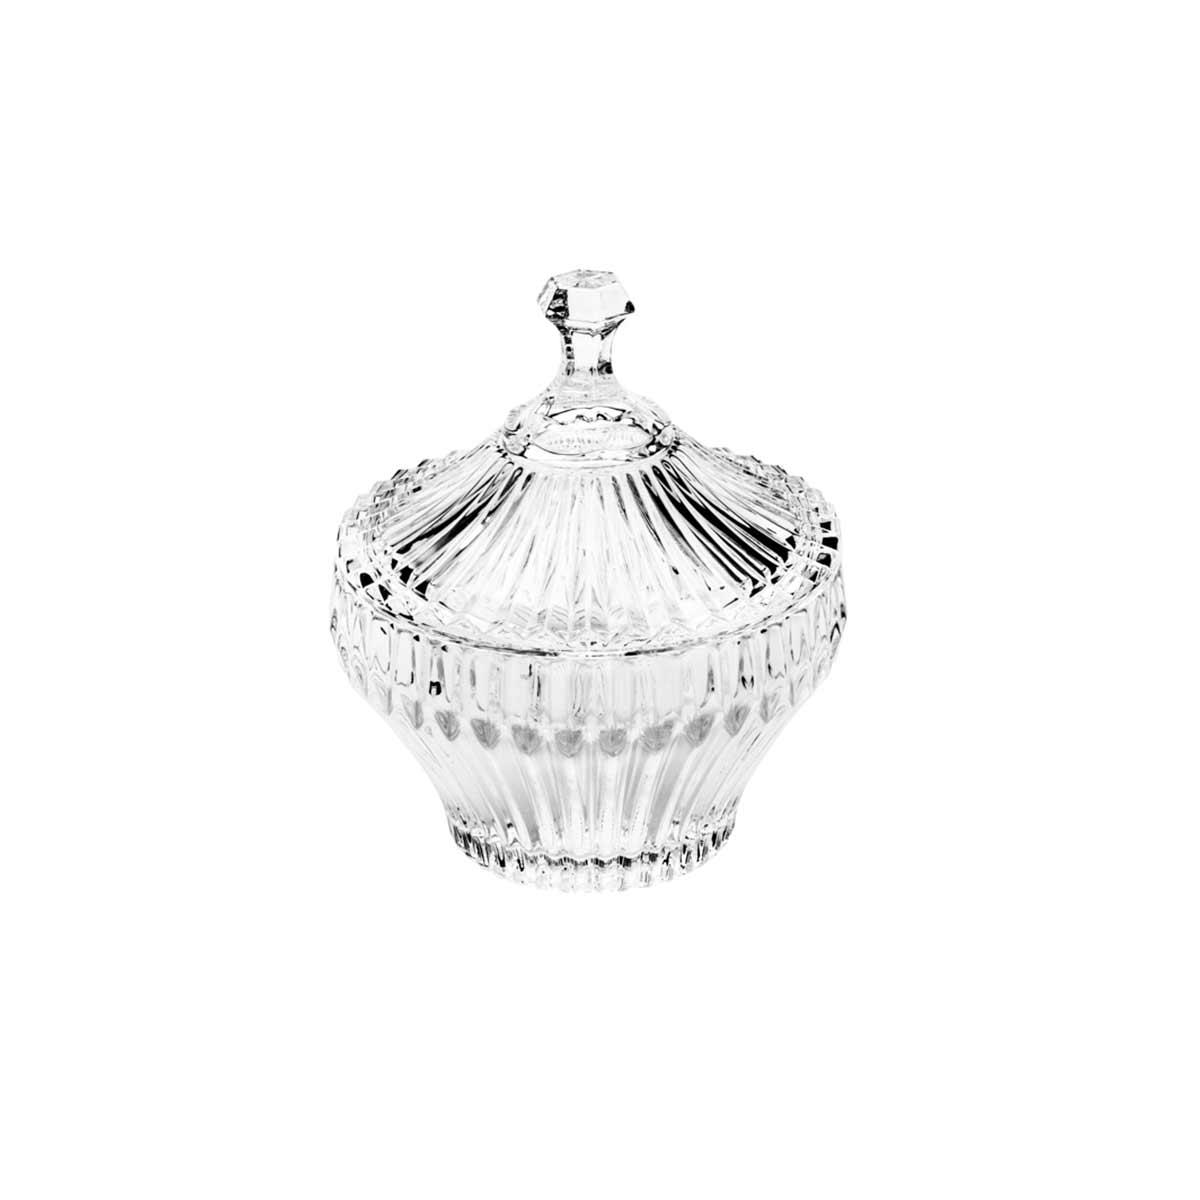 Potiche De Cristal Renaissance Pequeno Lyor